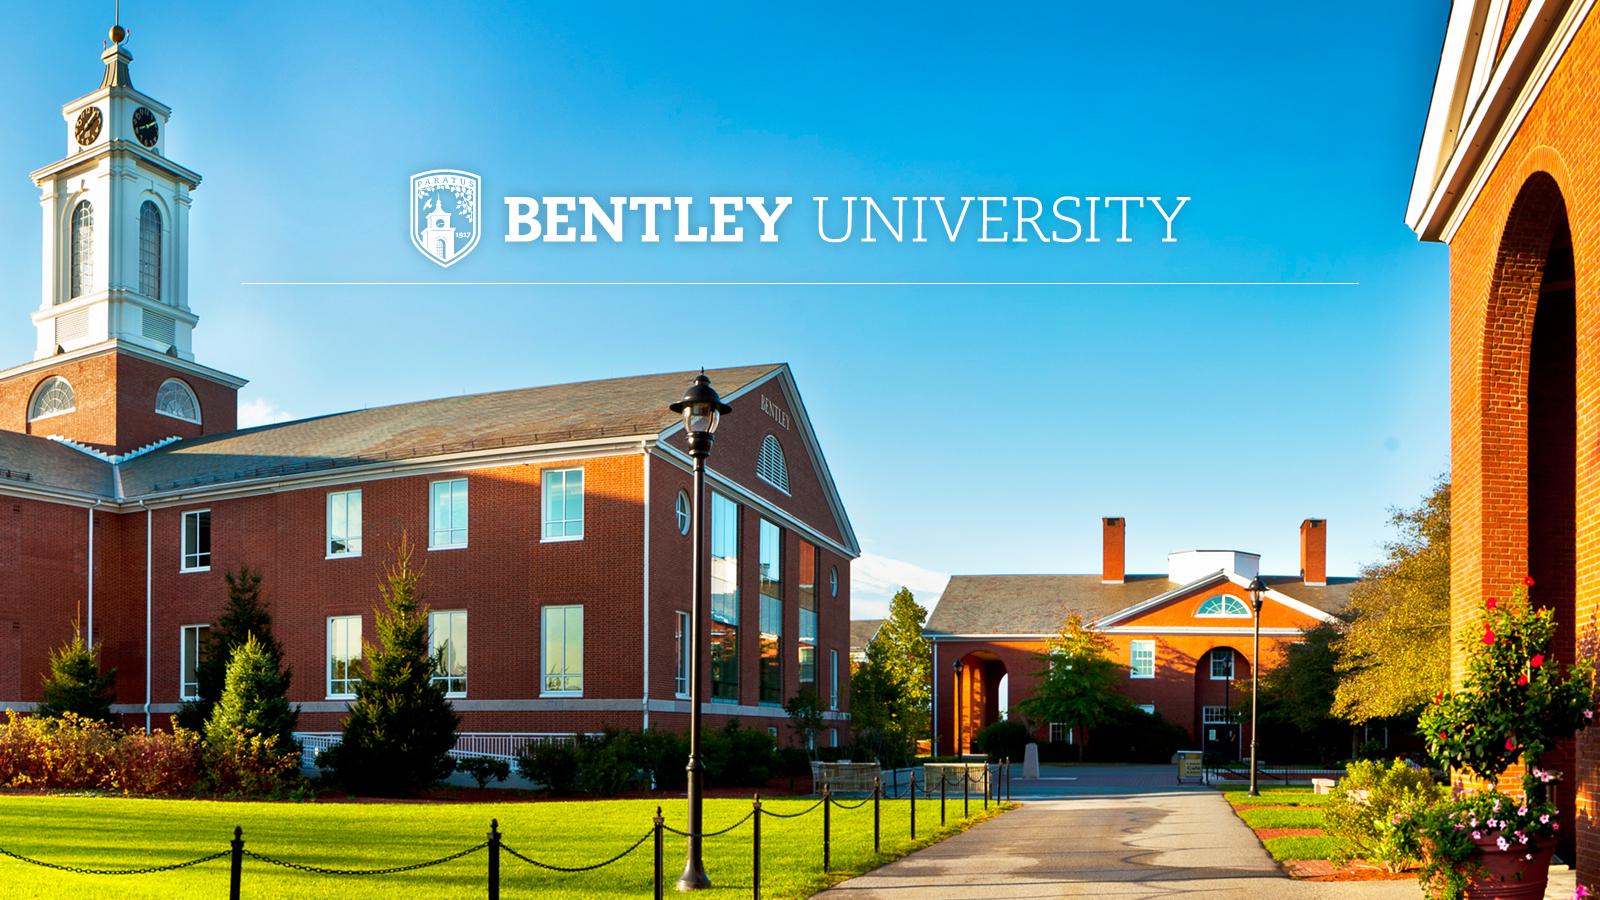 Bentley_Wallpaper_HP_1600x900_4a